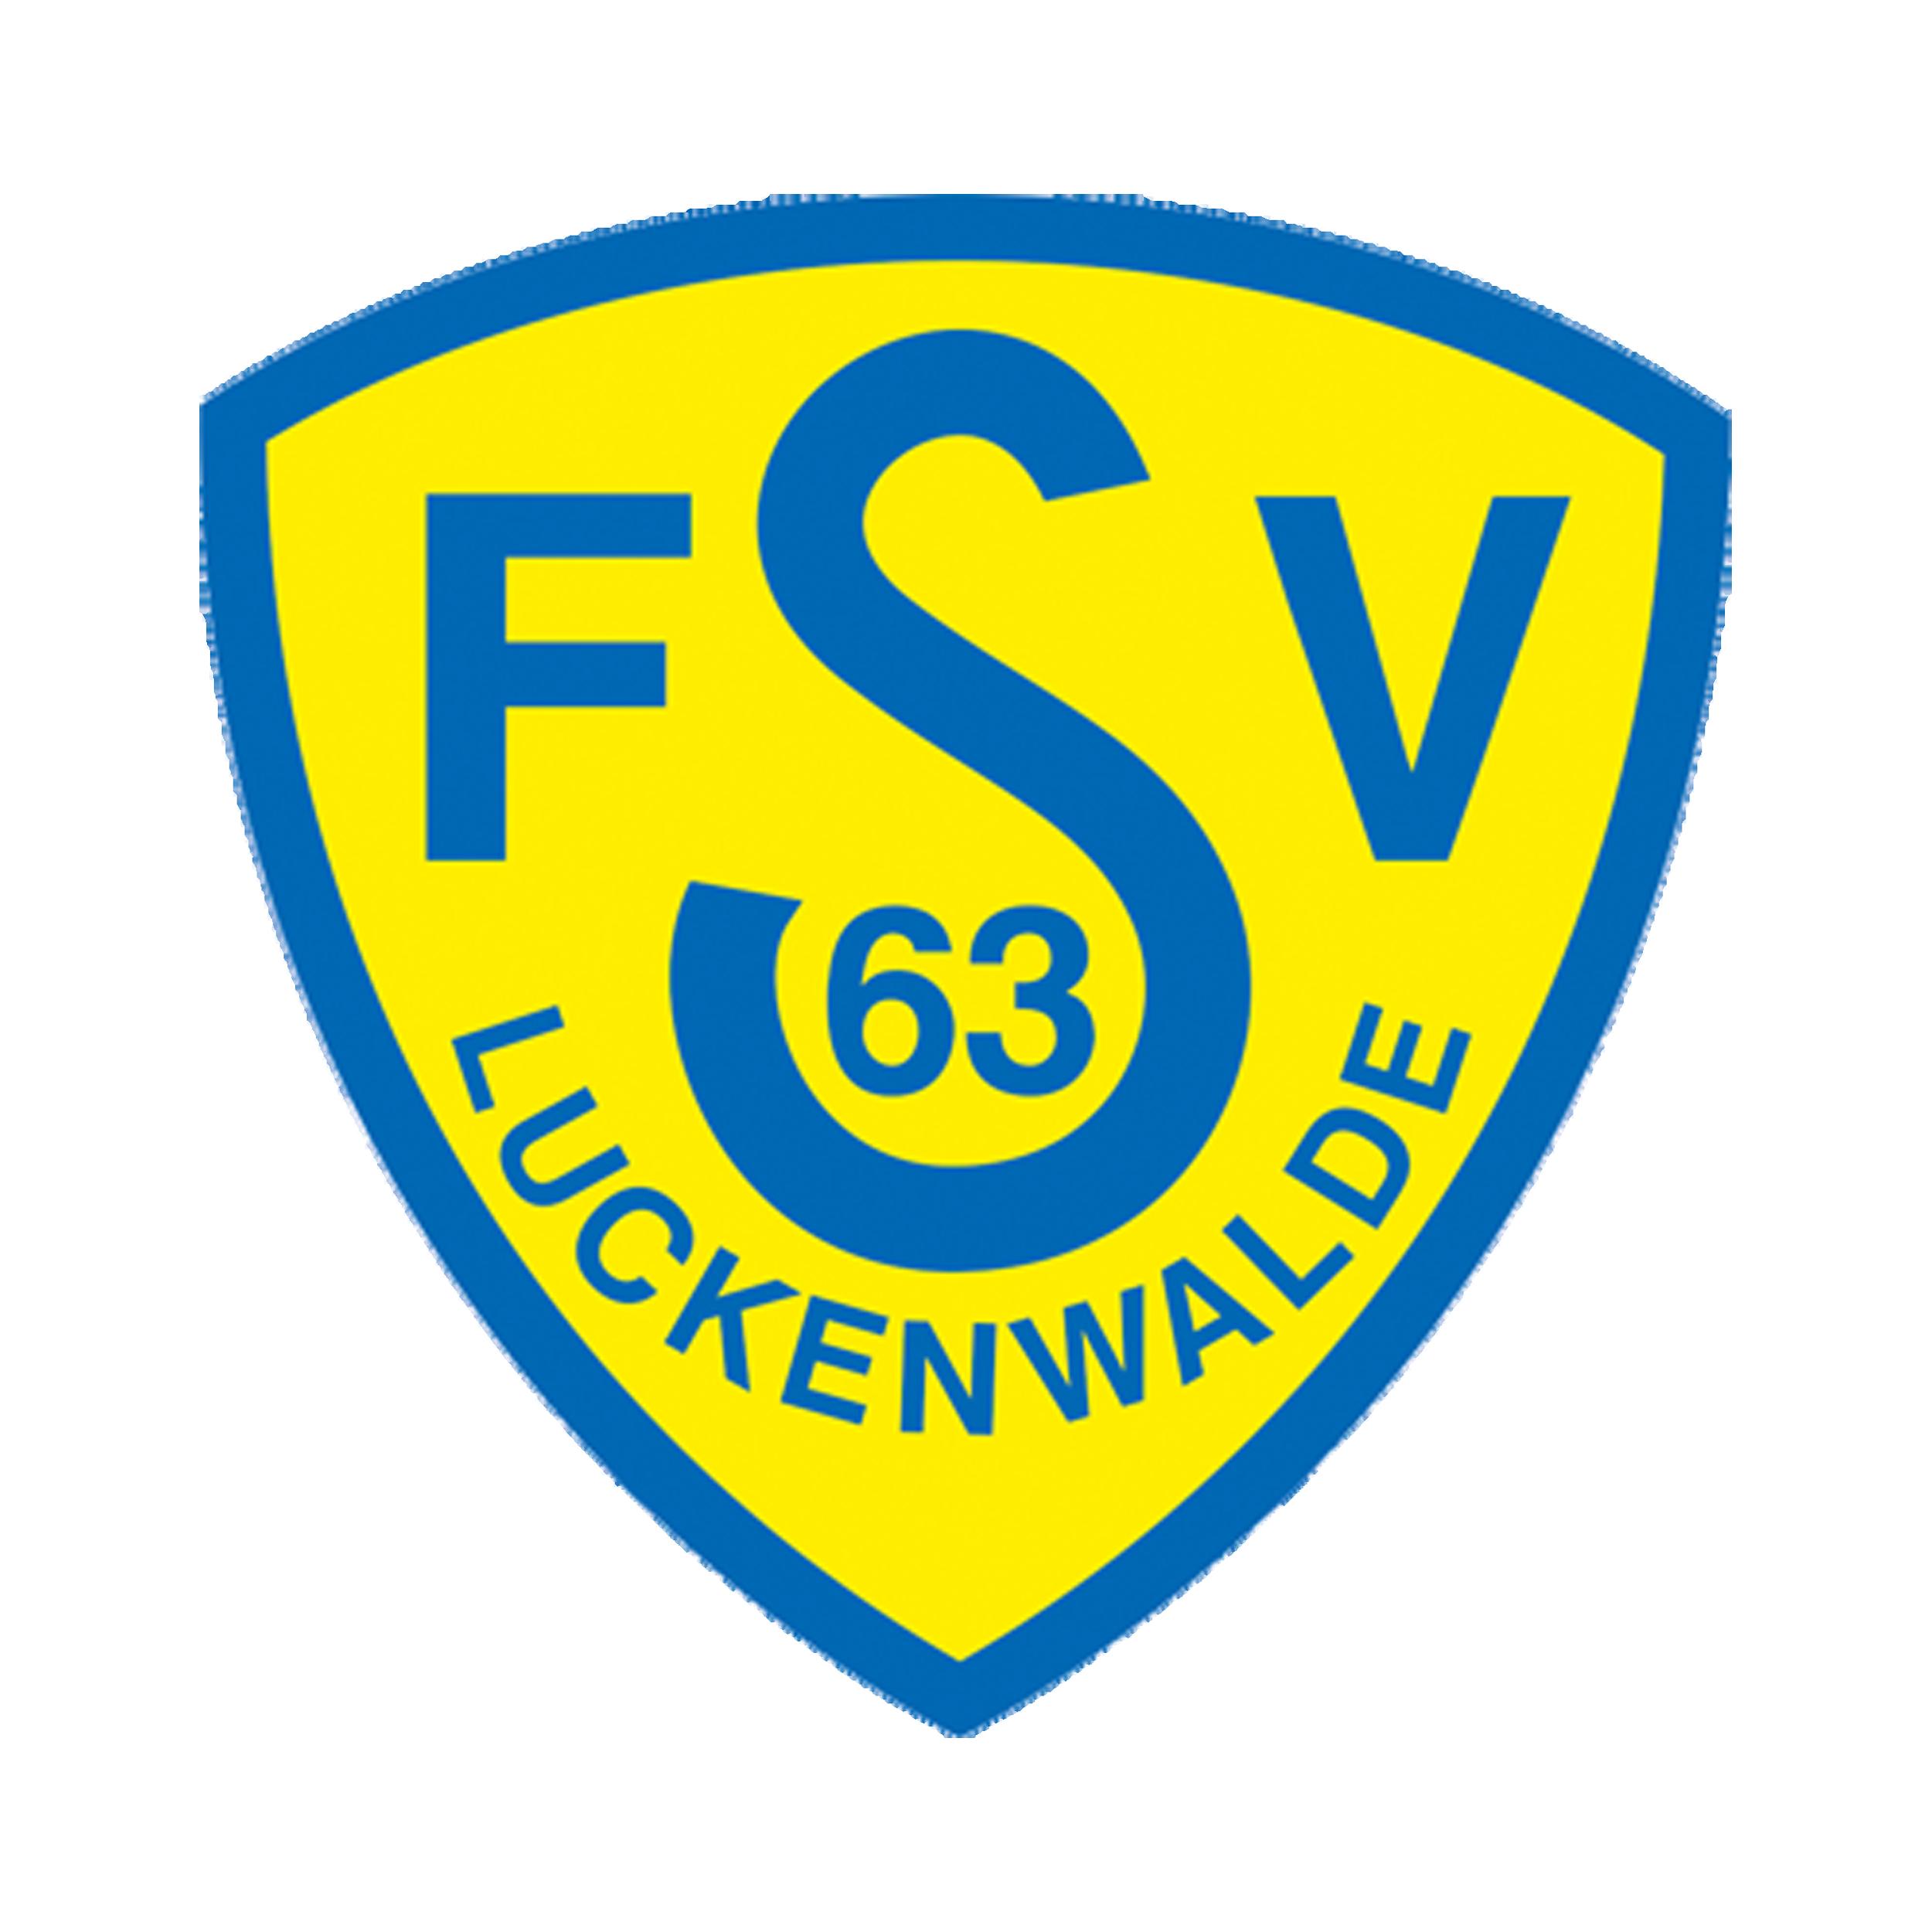 FSV 63 Luckenwalde e.V.